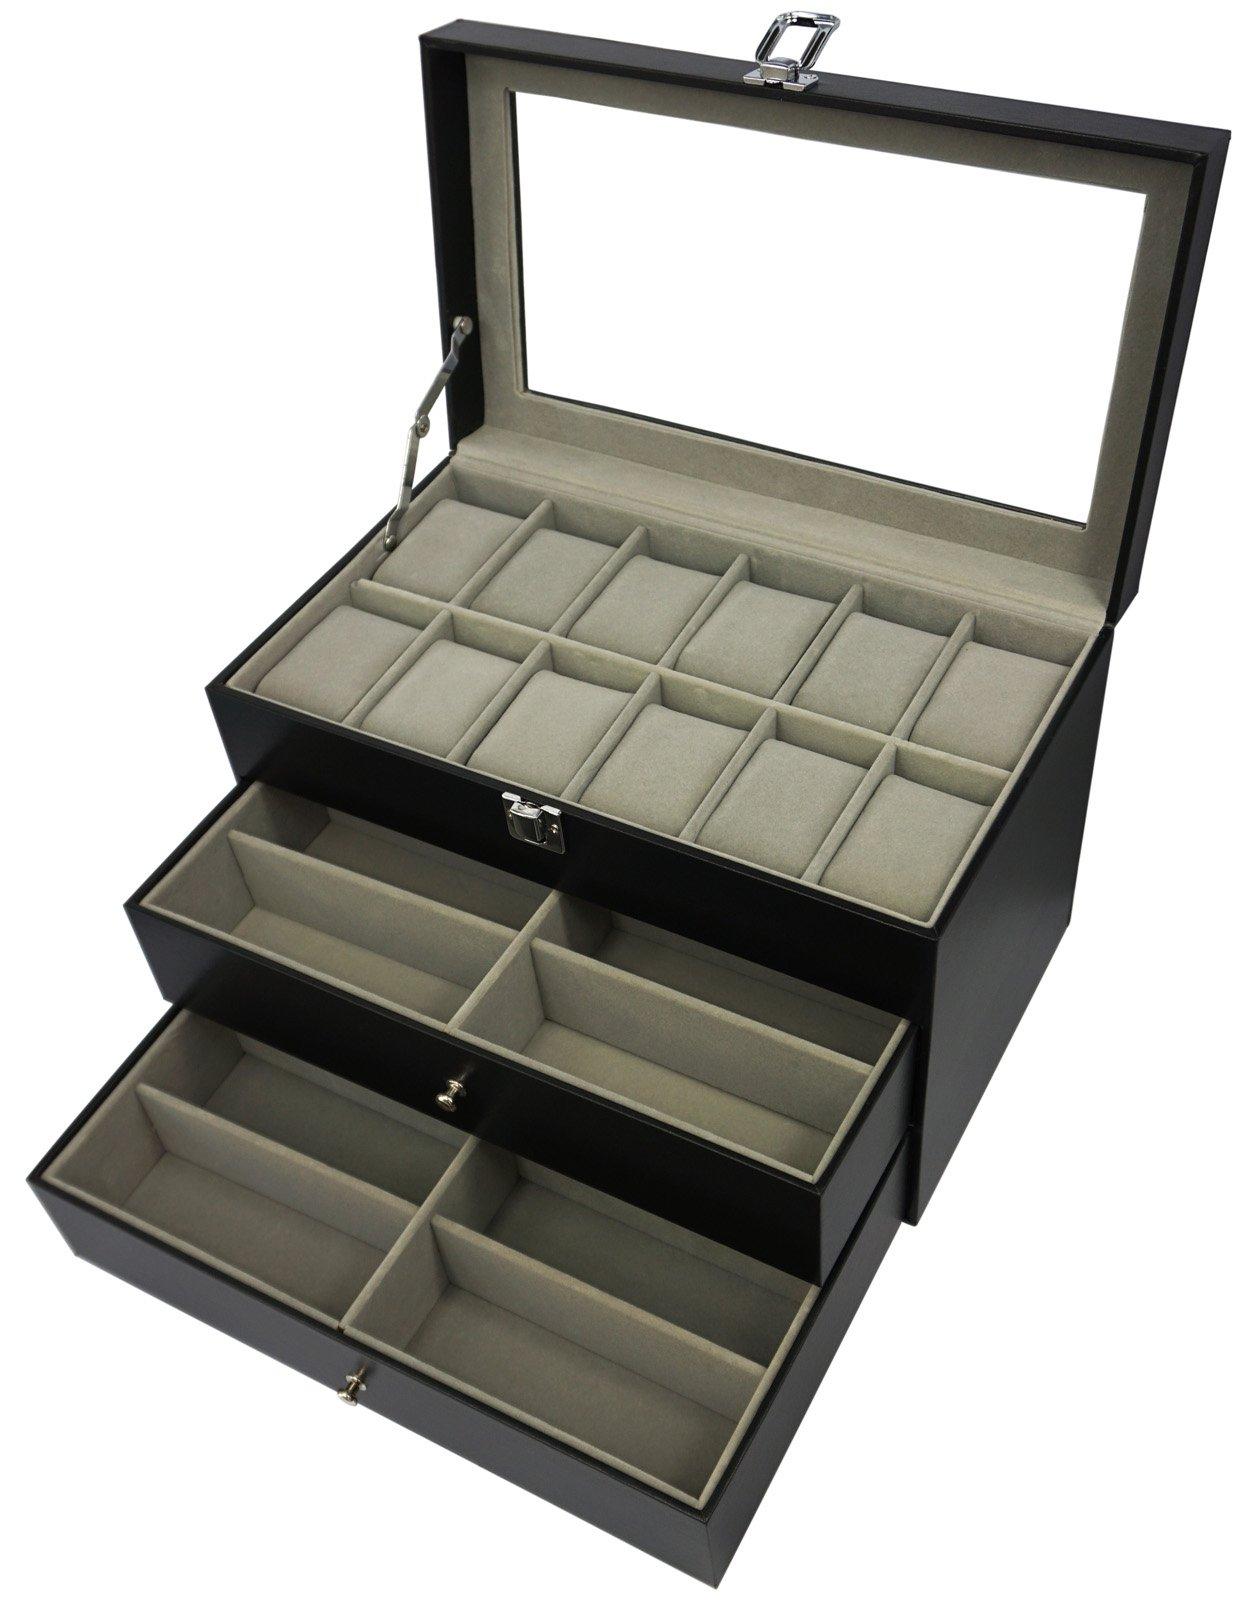 origia 手持12glasses and 12手表,太阳镜手表盒 EYEWEAR 配饰展示盒收纳